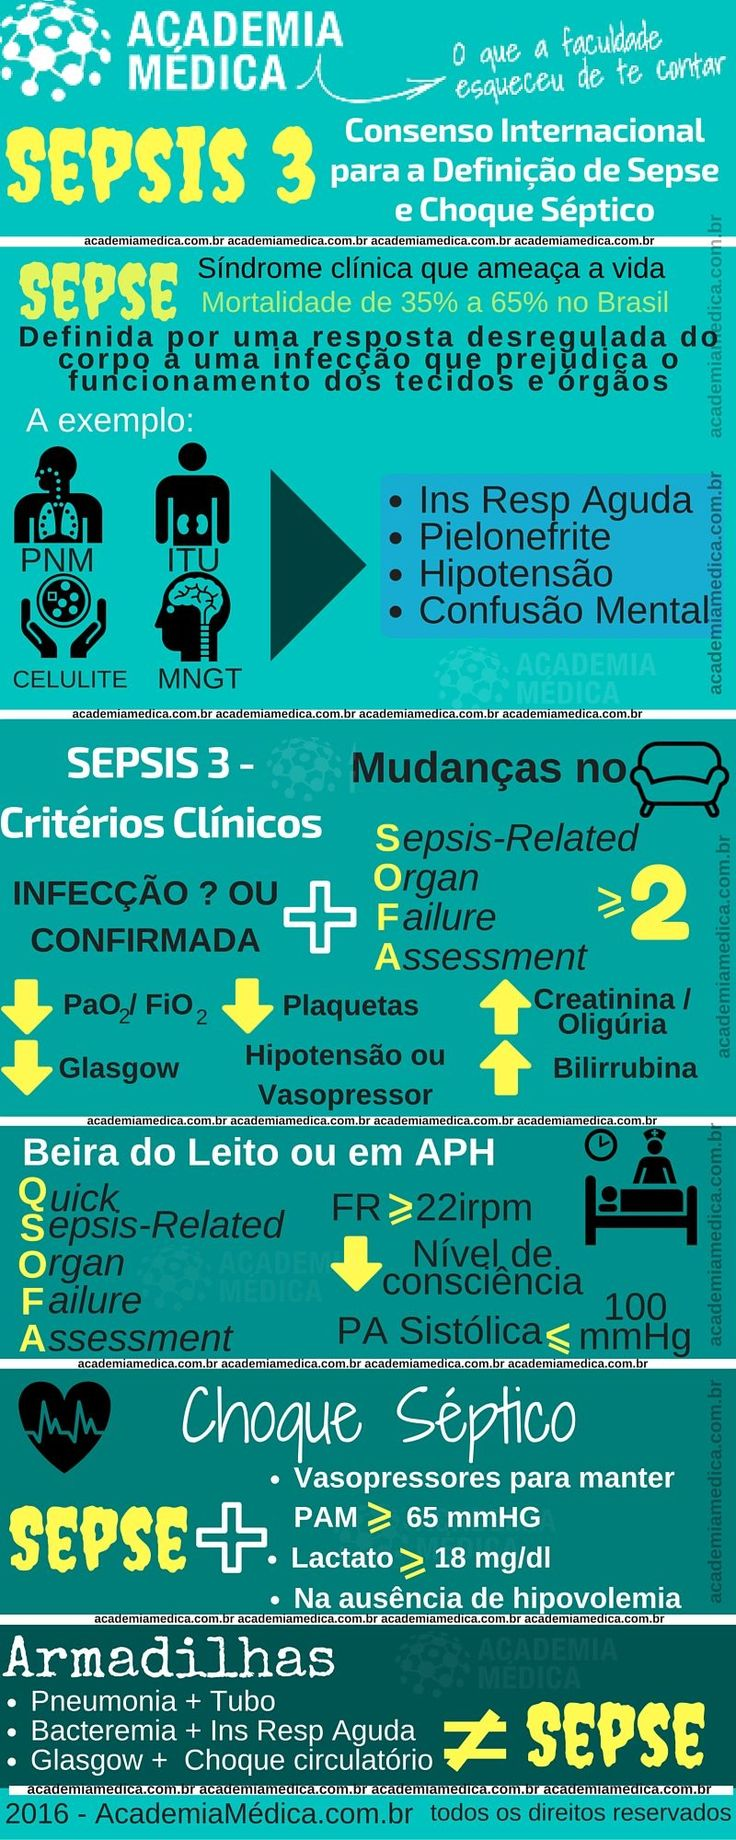 Sepsis 3 - Infográfico do Consenso Internacional sobre sepse